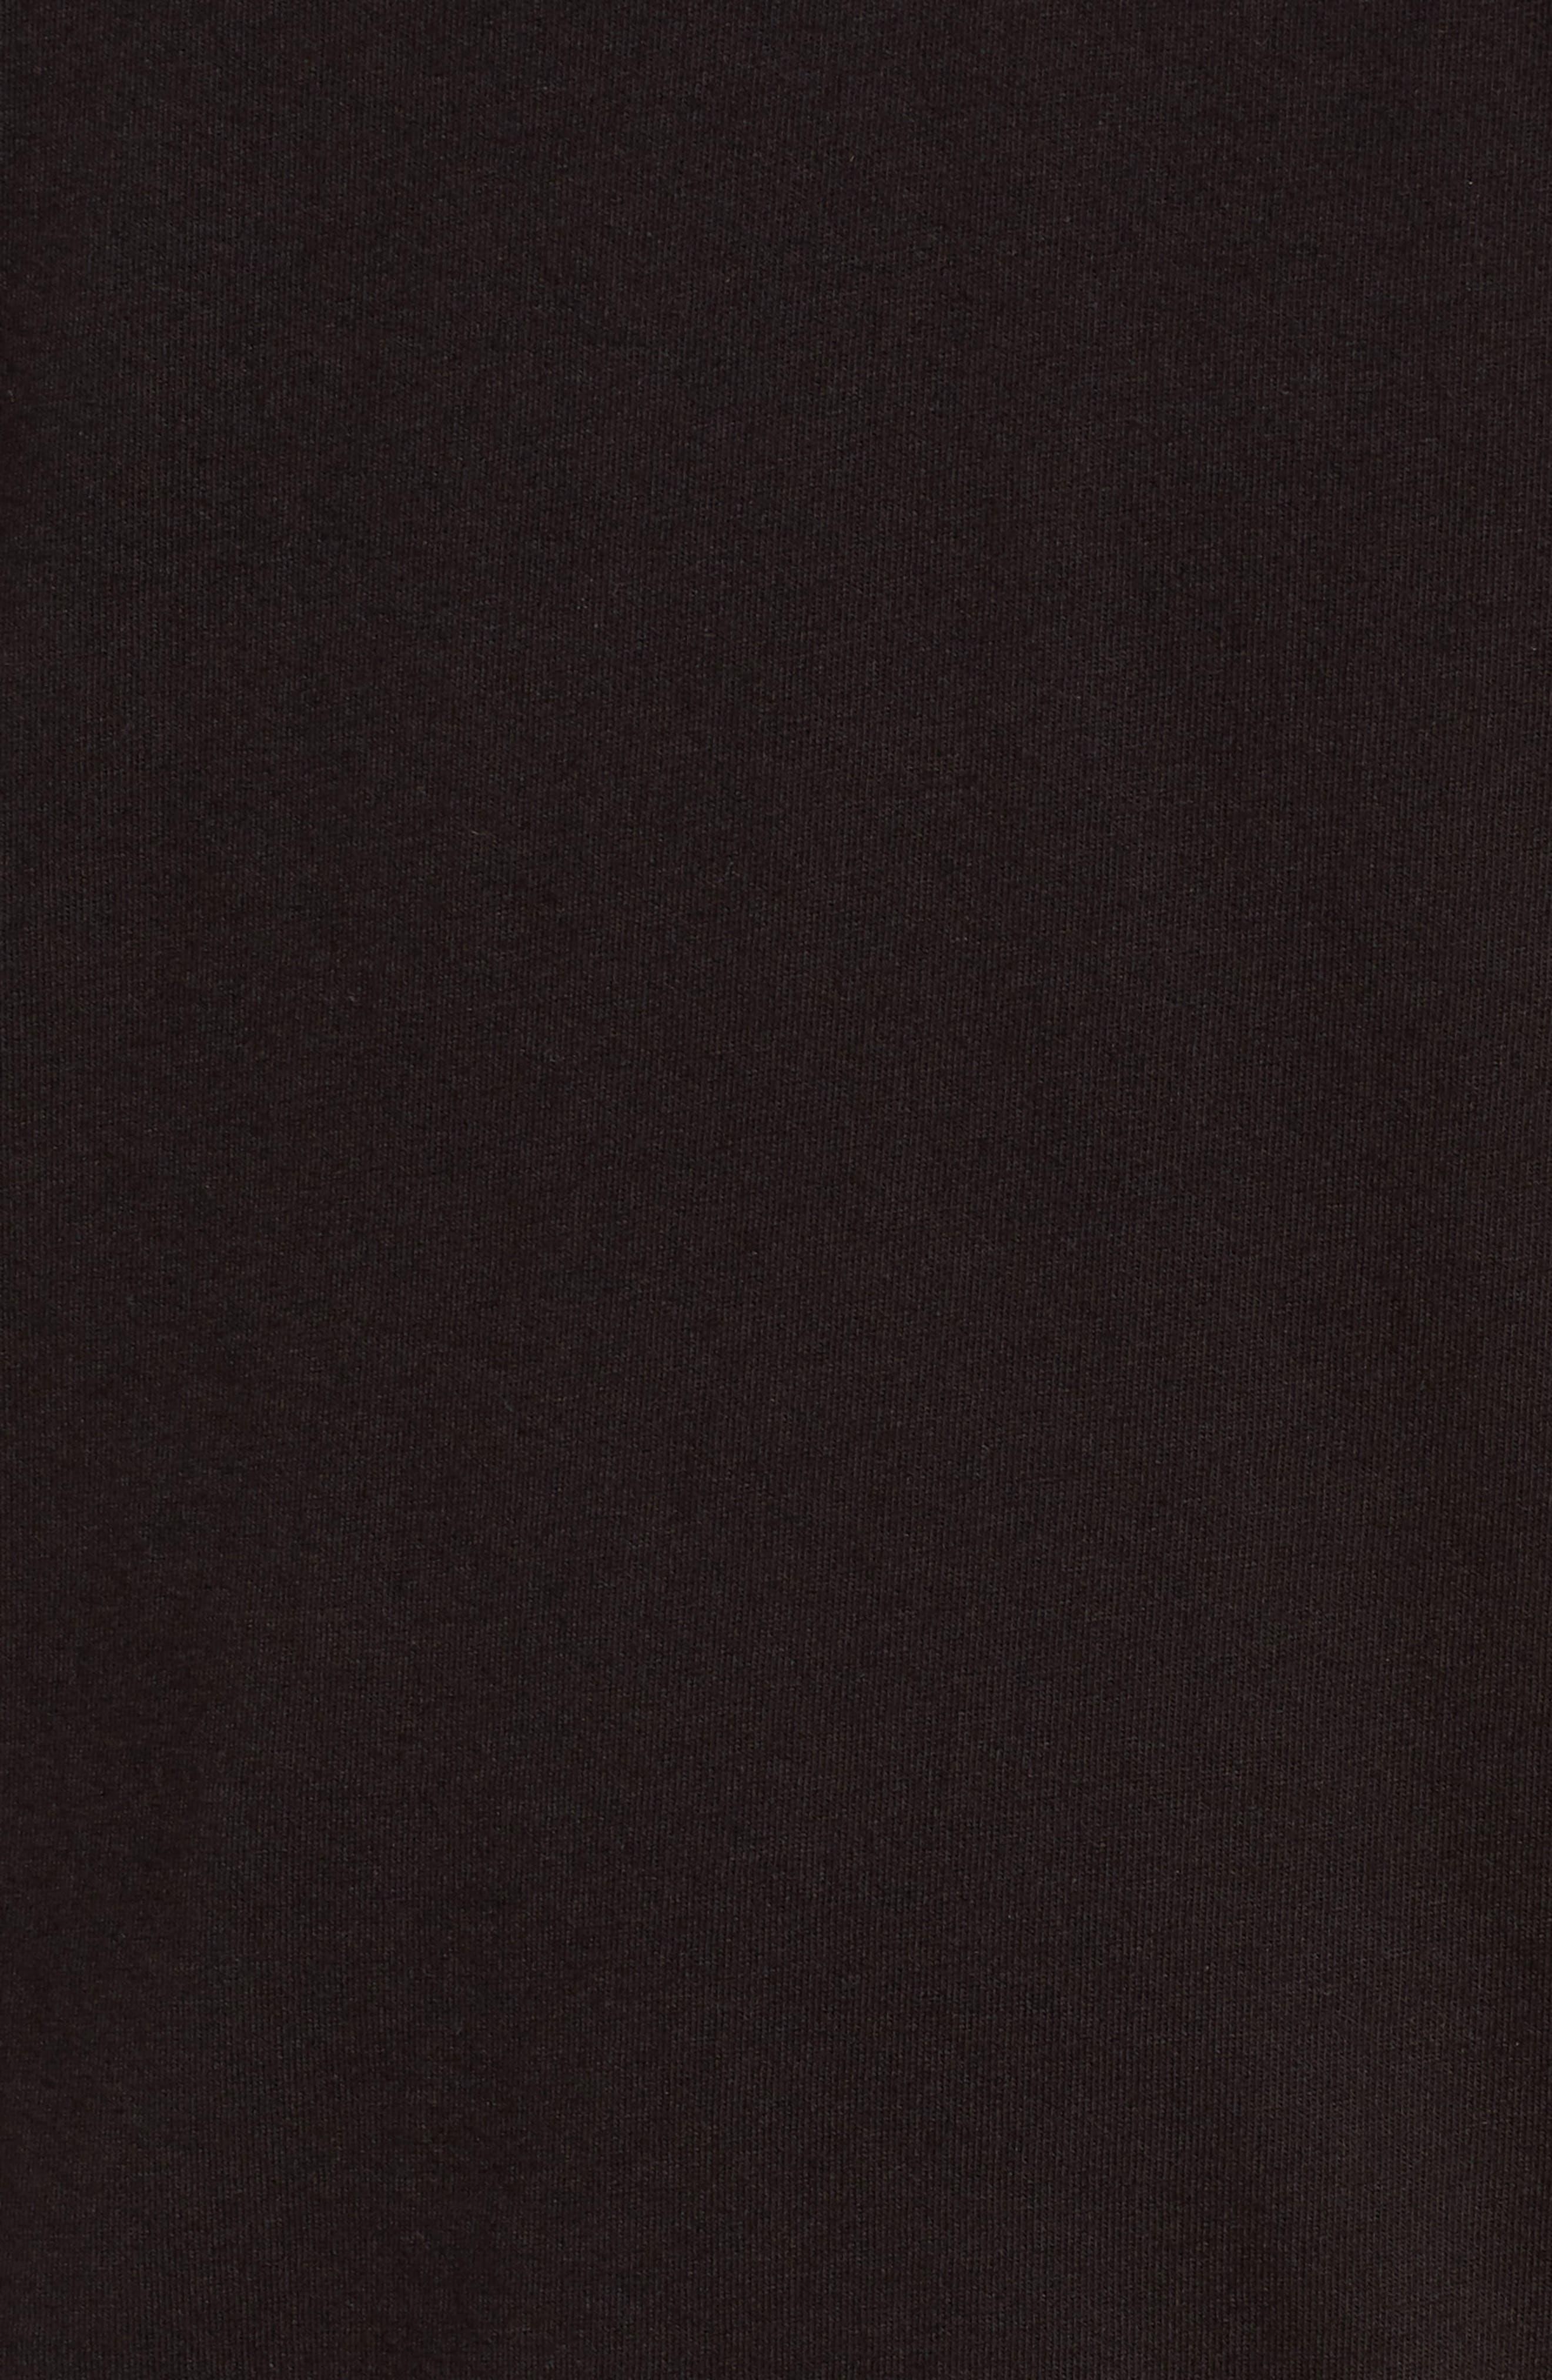 Short Sleeve Henley,                             Alternate thumbnail 5, color,                             001